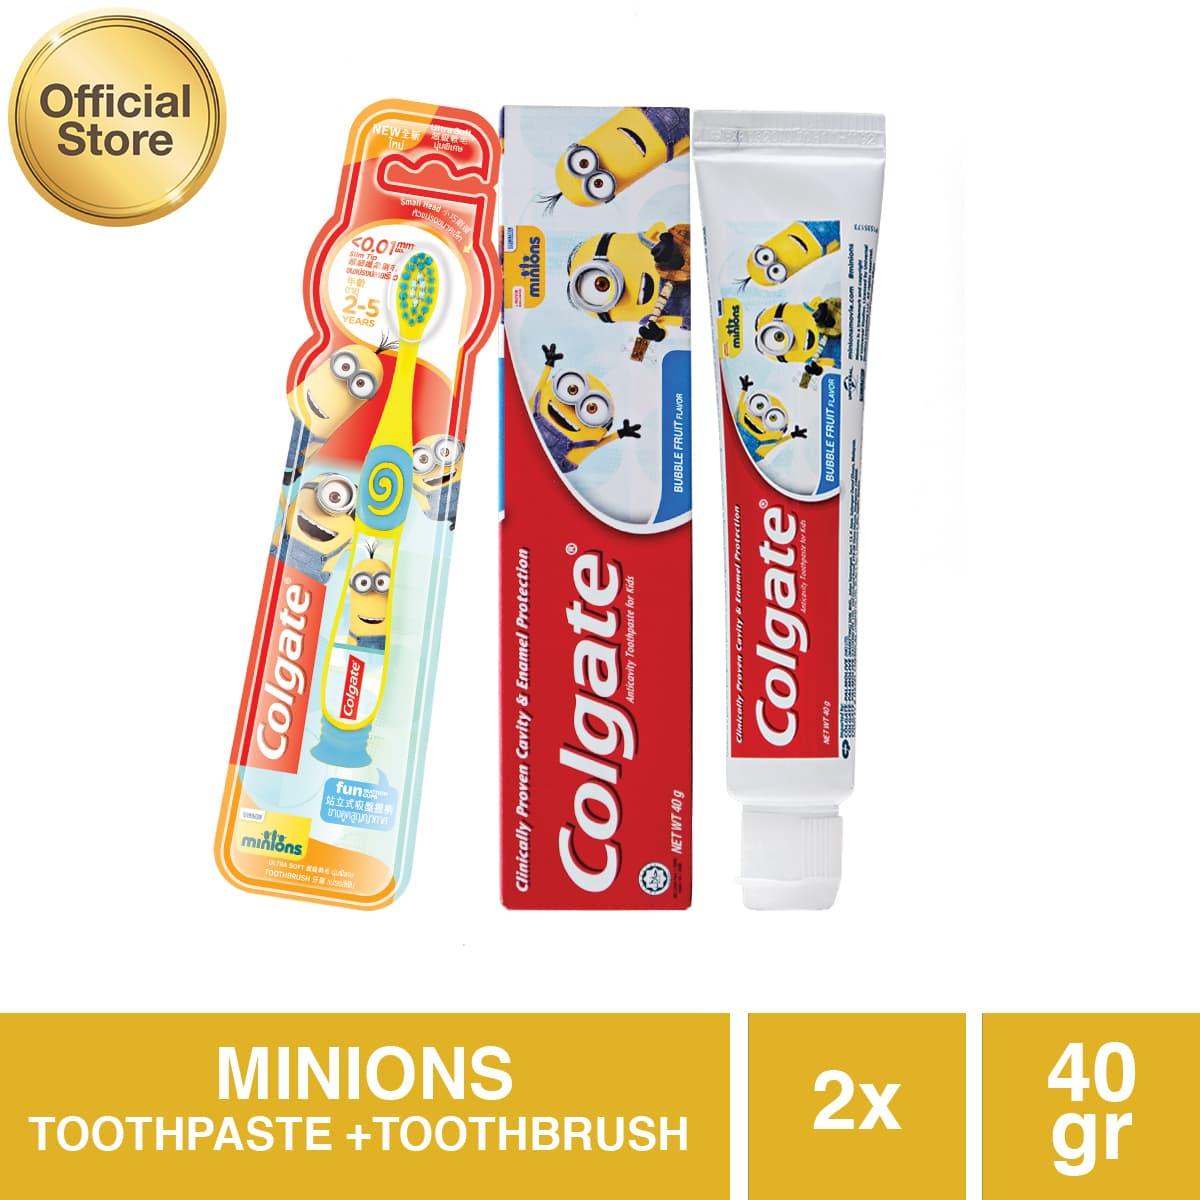 Body Care Blanjacom Head Shoulders Sampo Cool Menthol 480 Ml Paket Isi 2 Colgate Toothpaste For Kids Minions 40gr Toothbrush 5yo Blanja